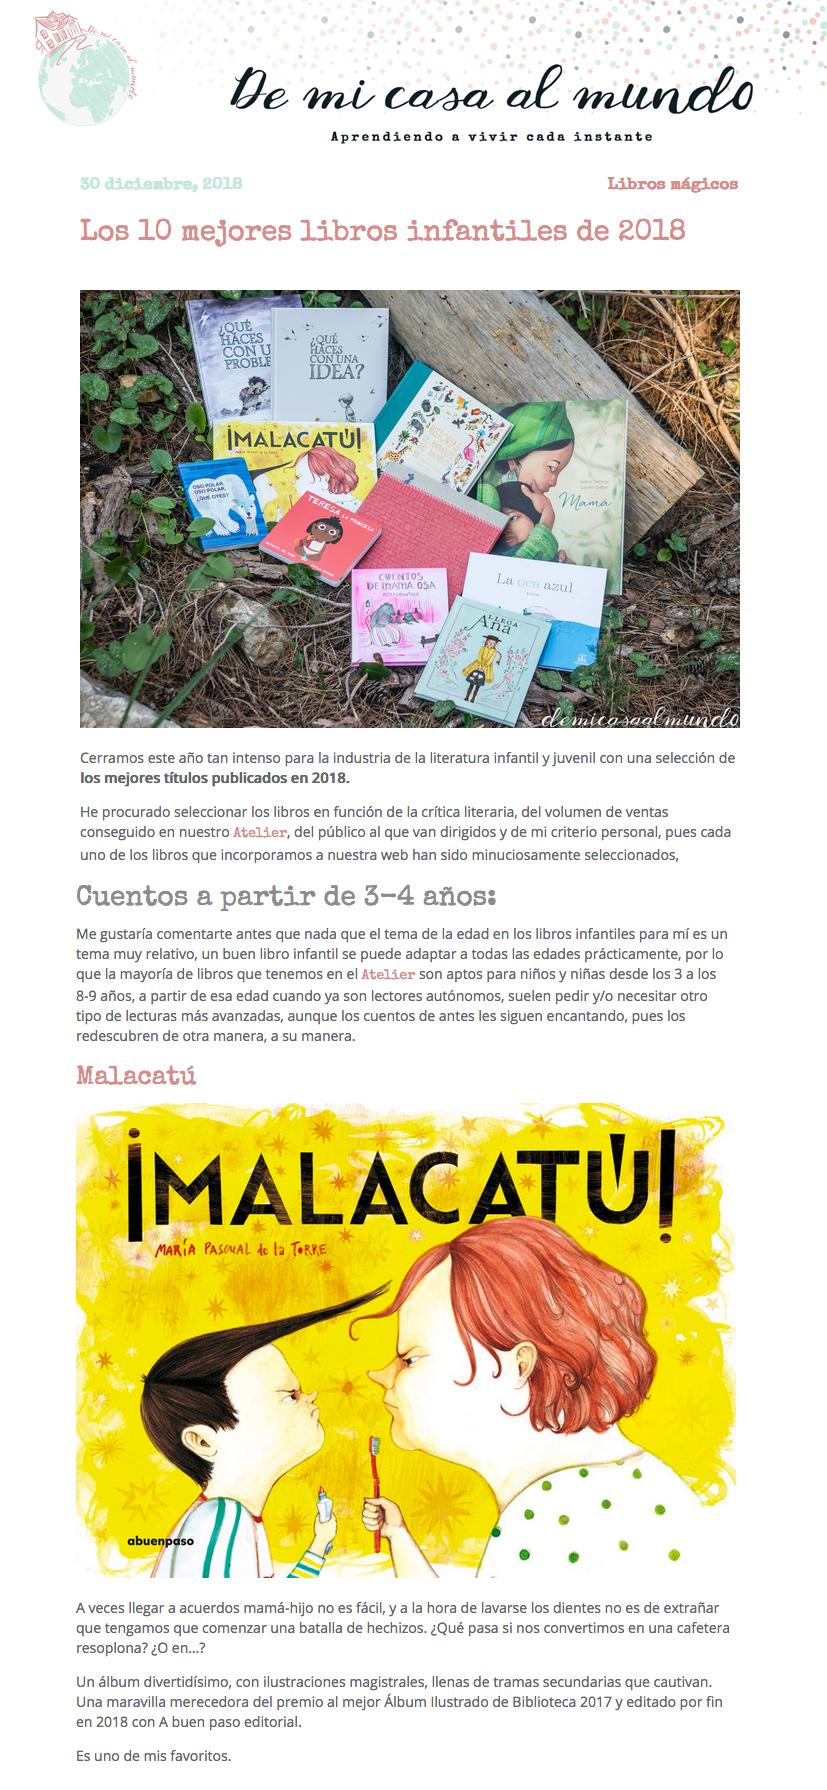 DeMiCasaAlMundo_Malacatu.jpg